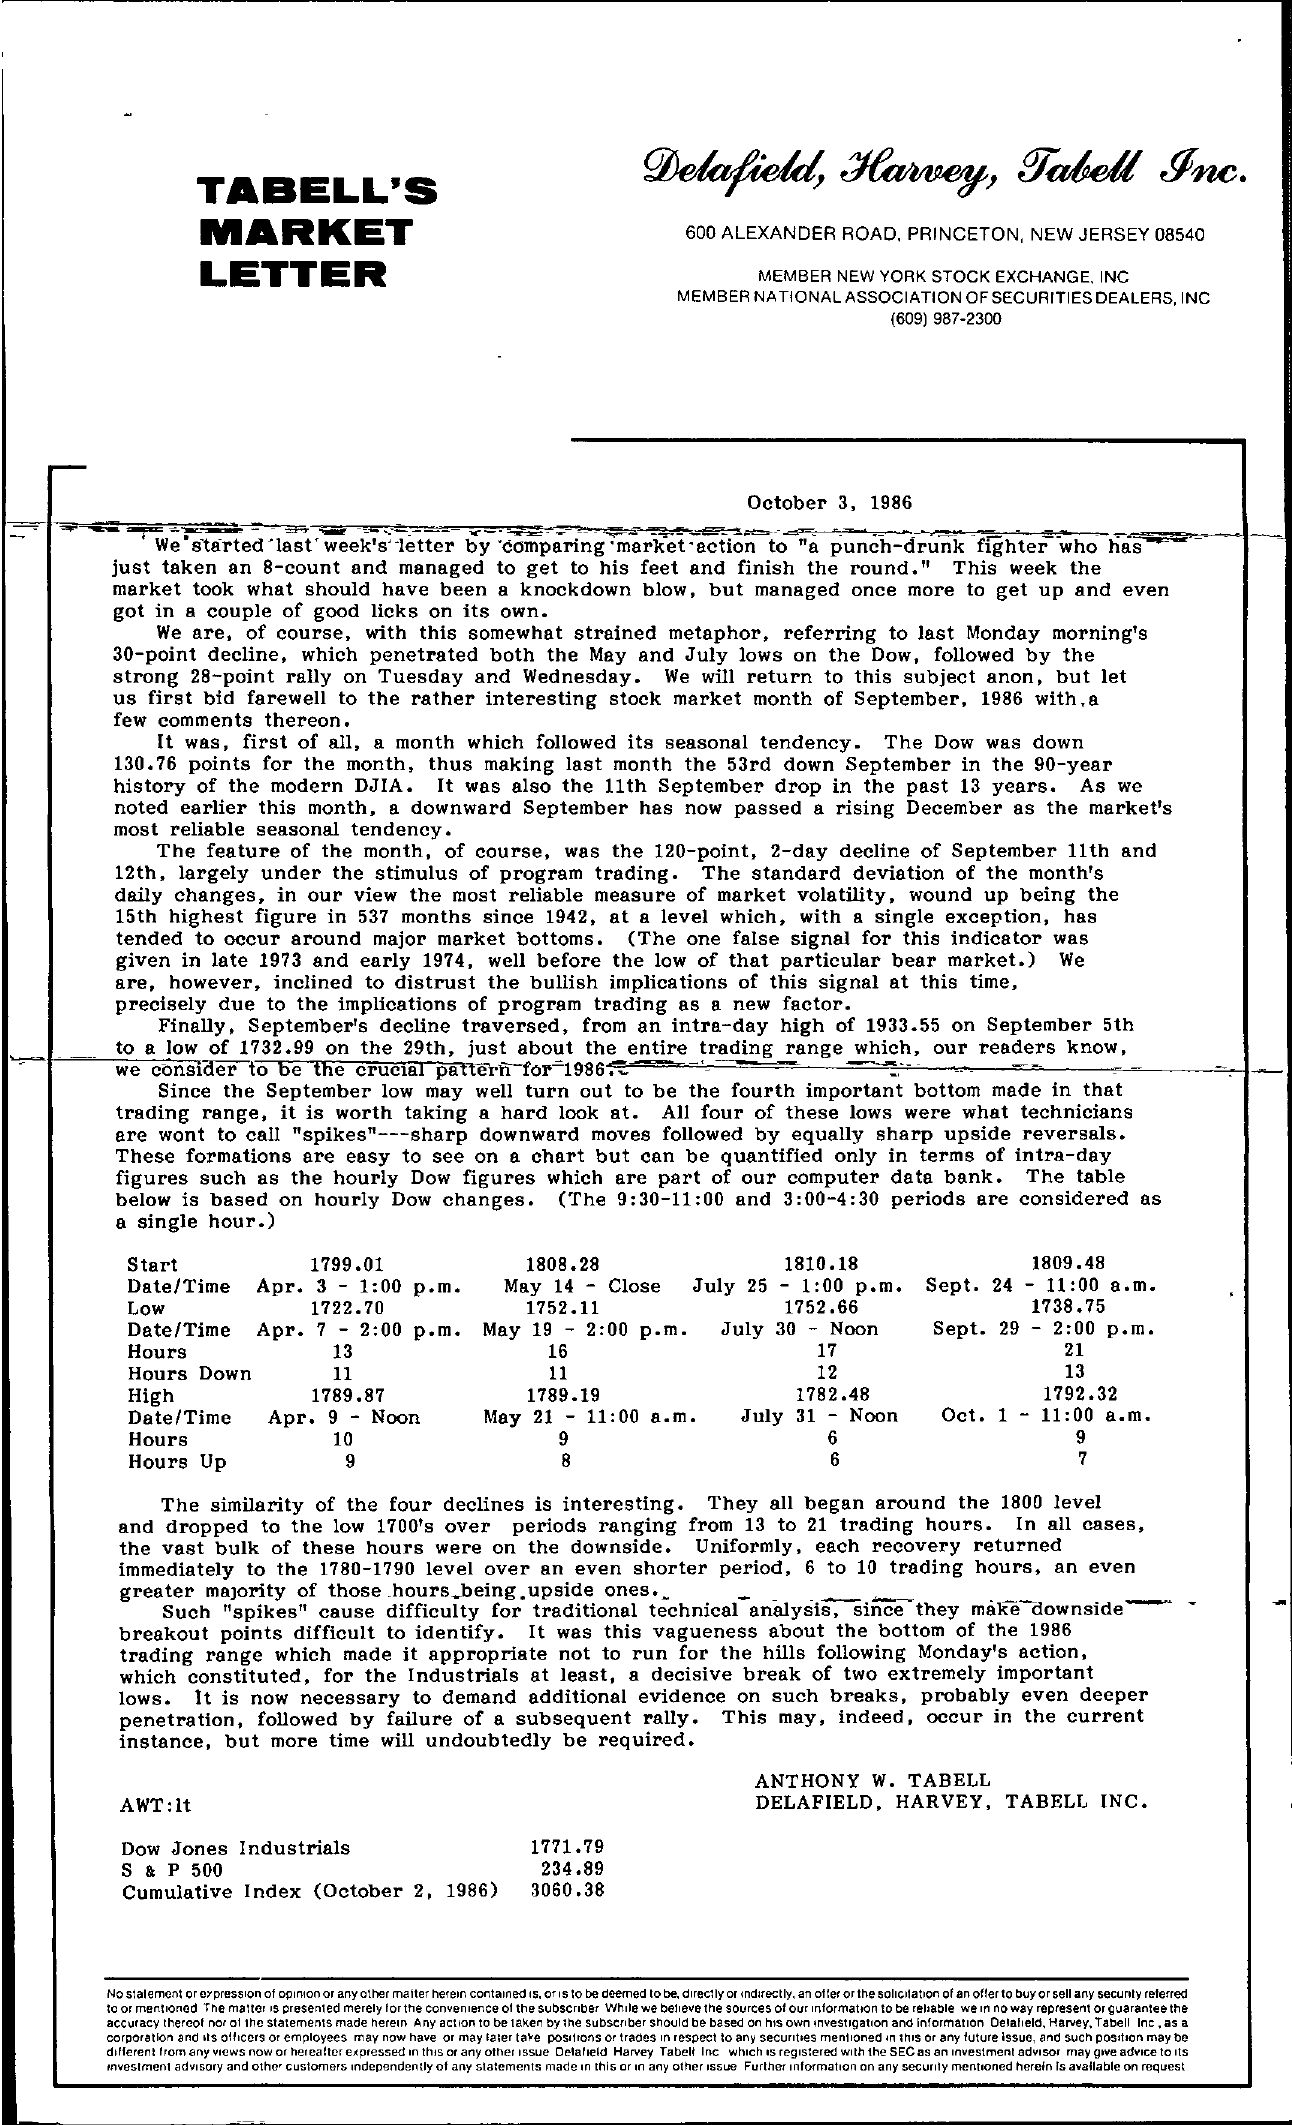 Tabell's Market Letter - October 03, 1986